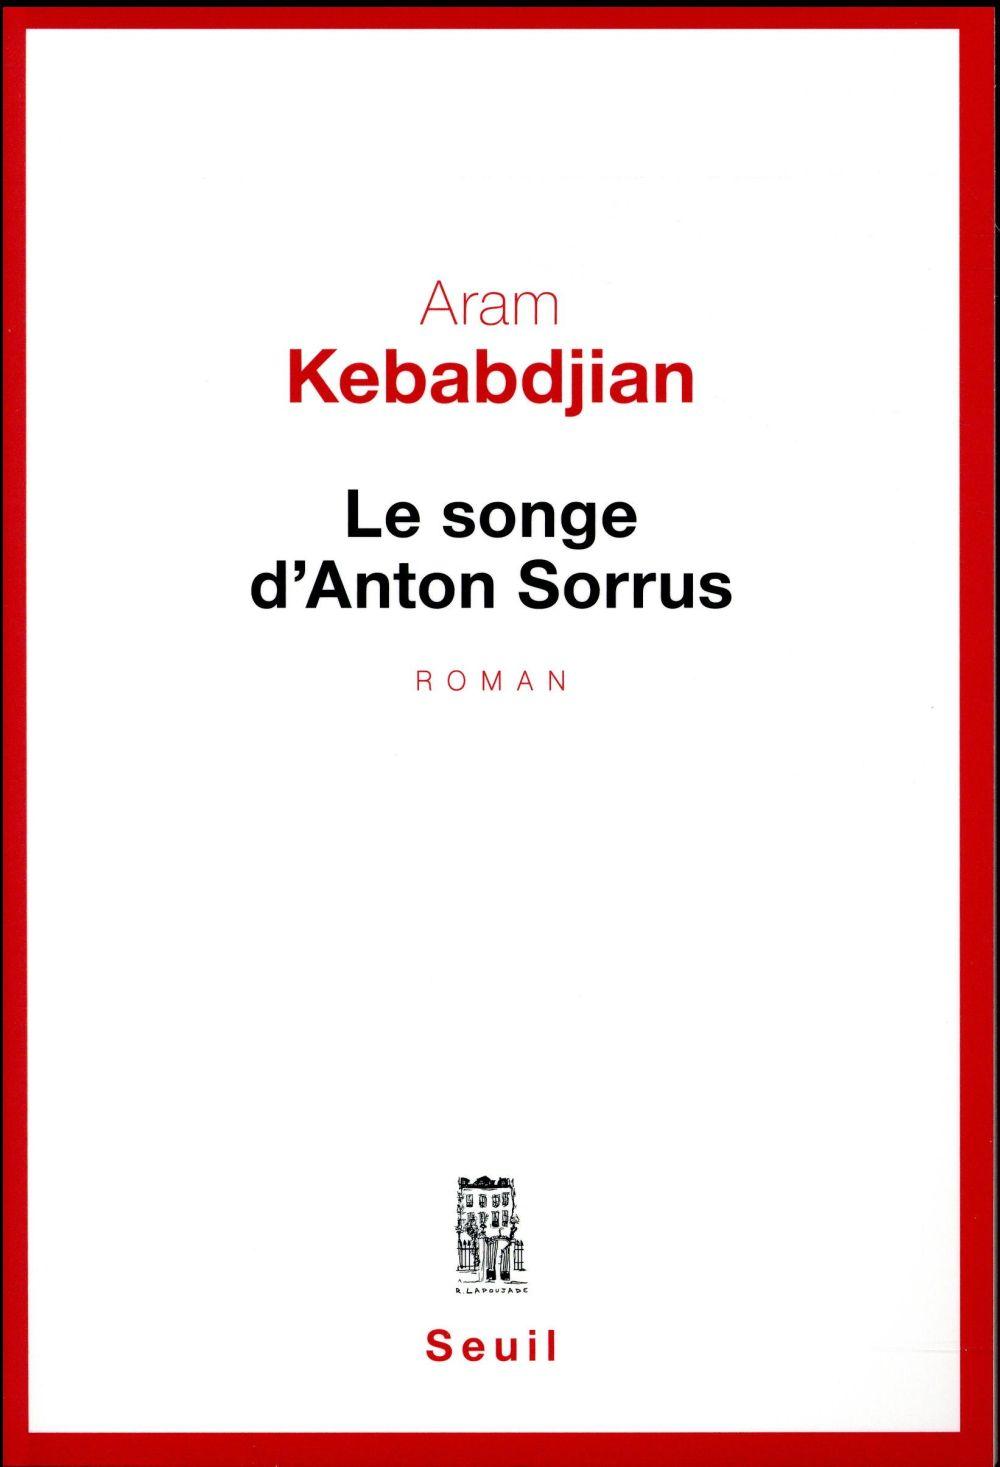 Le songe d'Anton Sorrus